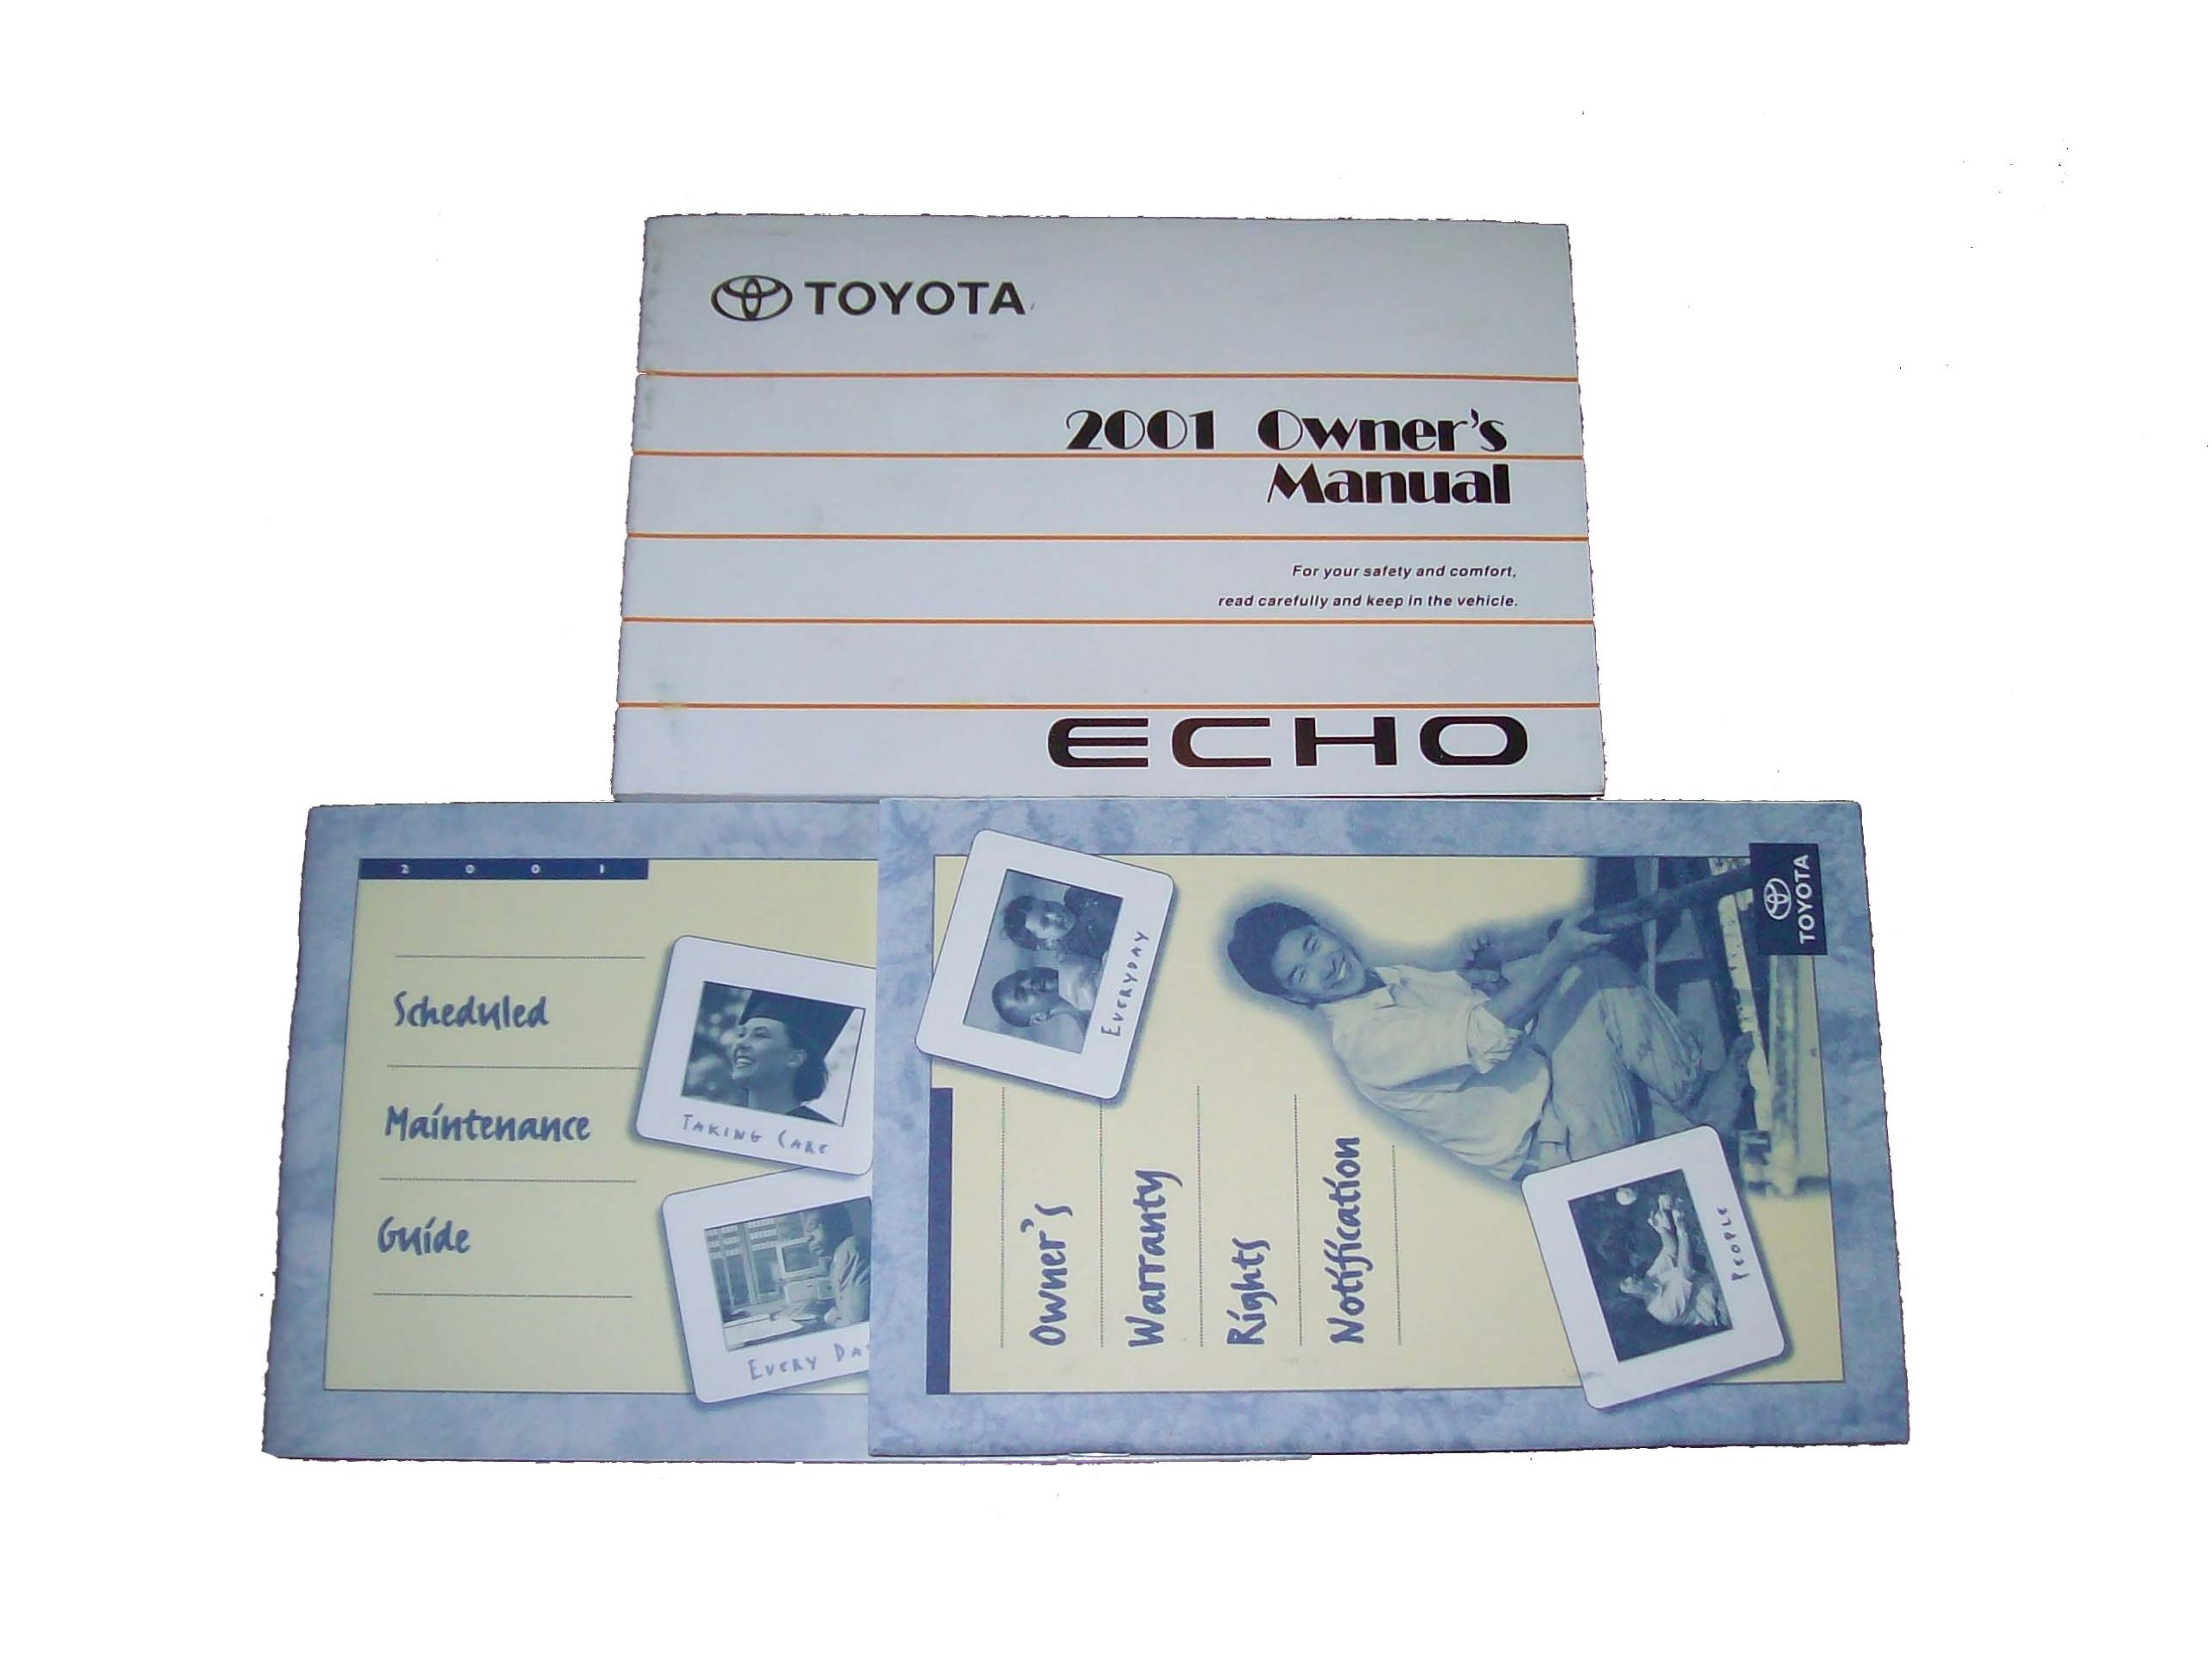 2001 toyota echo owners manual toyota amazon com books rh amazon com Manual Echoj Toyota 2001 Jornrepair Toyota Echo 2001 Carburetor Diagram